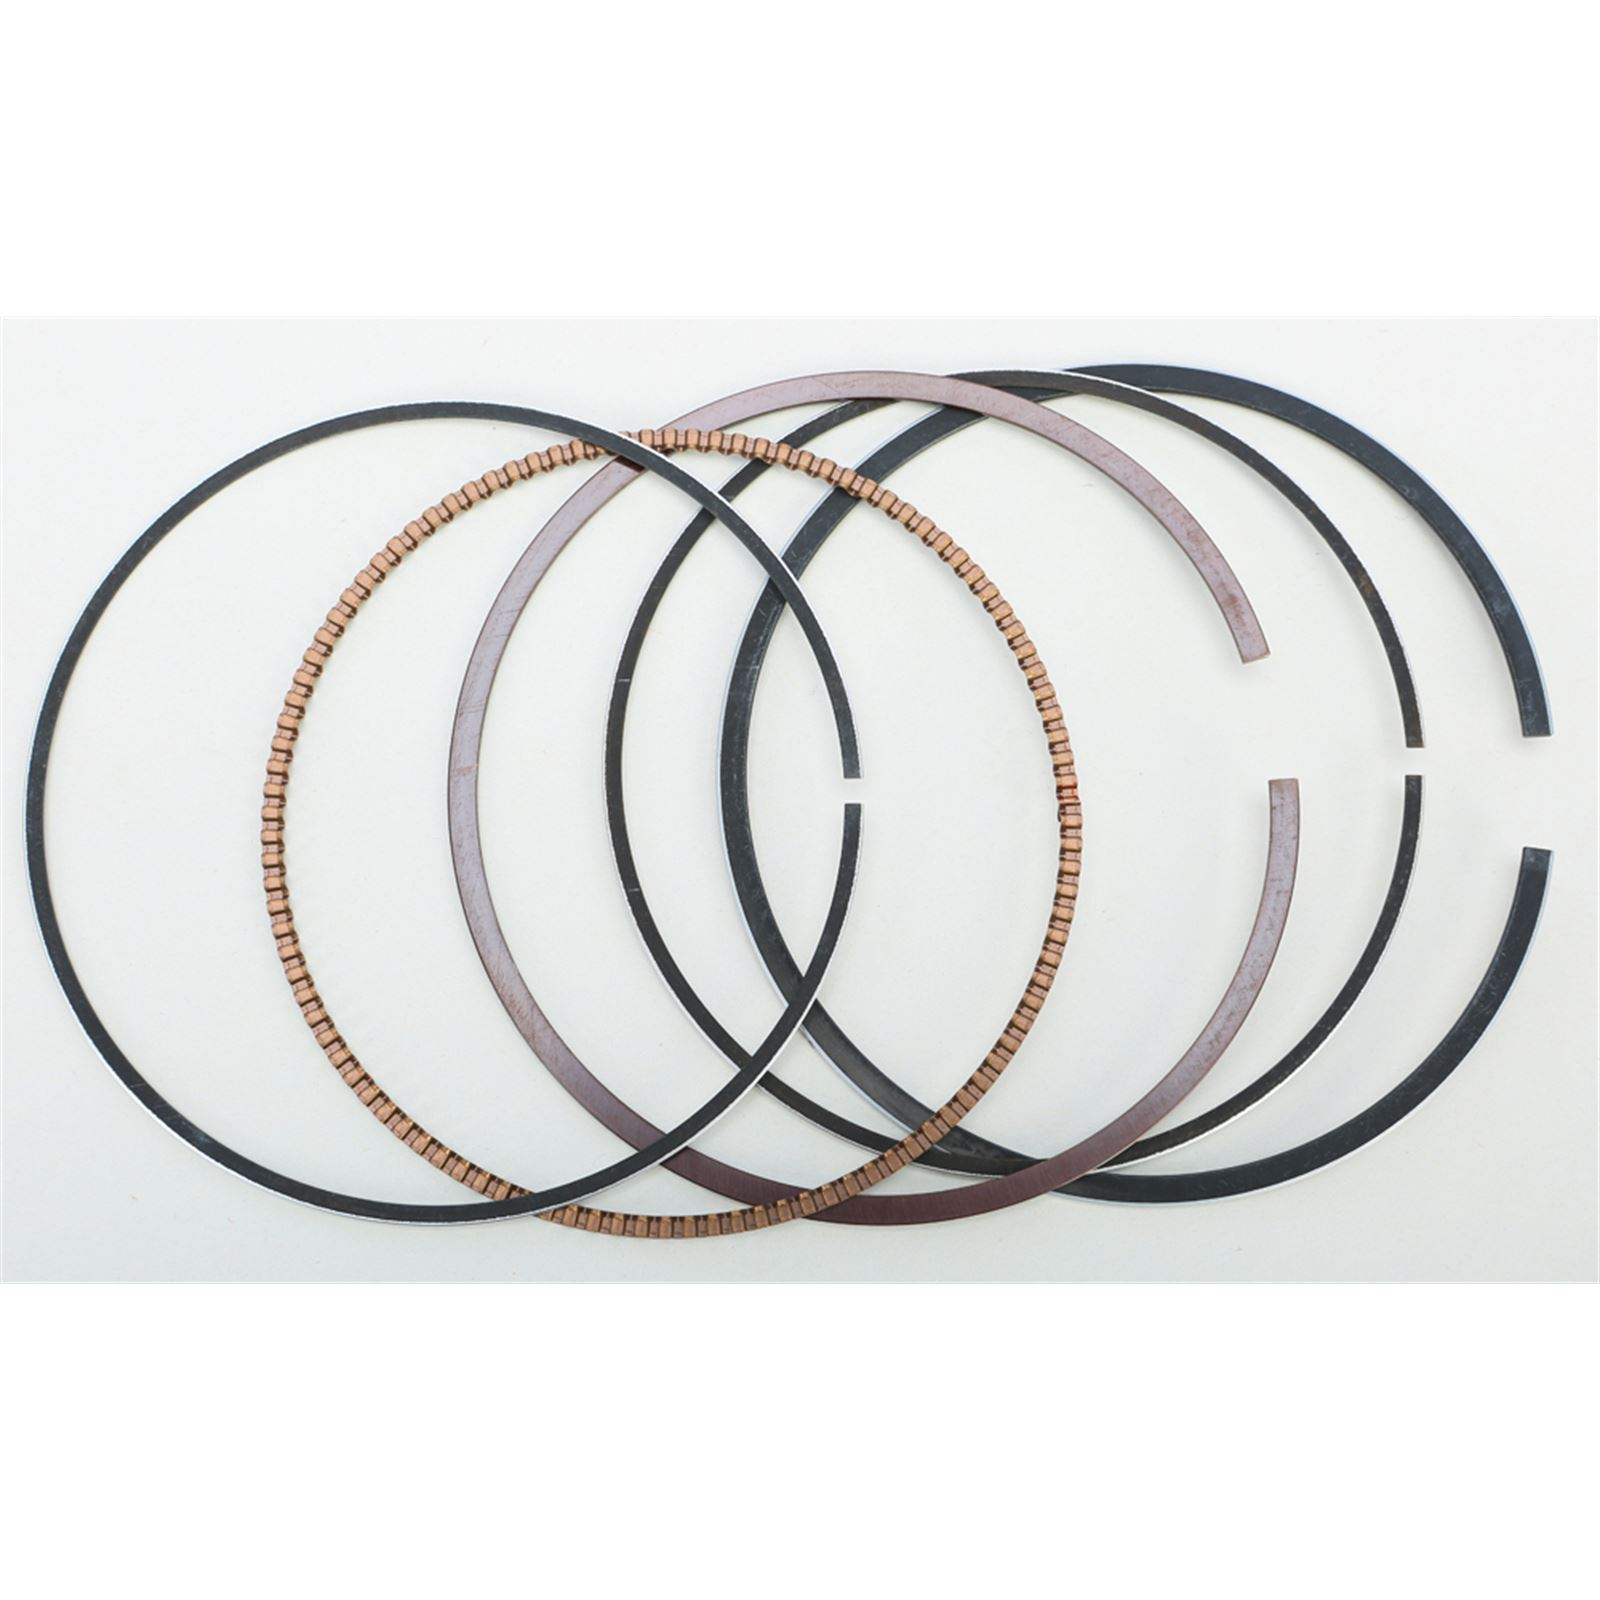 Prox Piston Rings